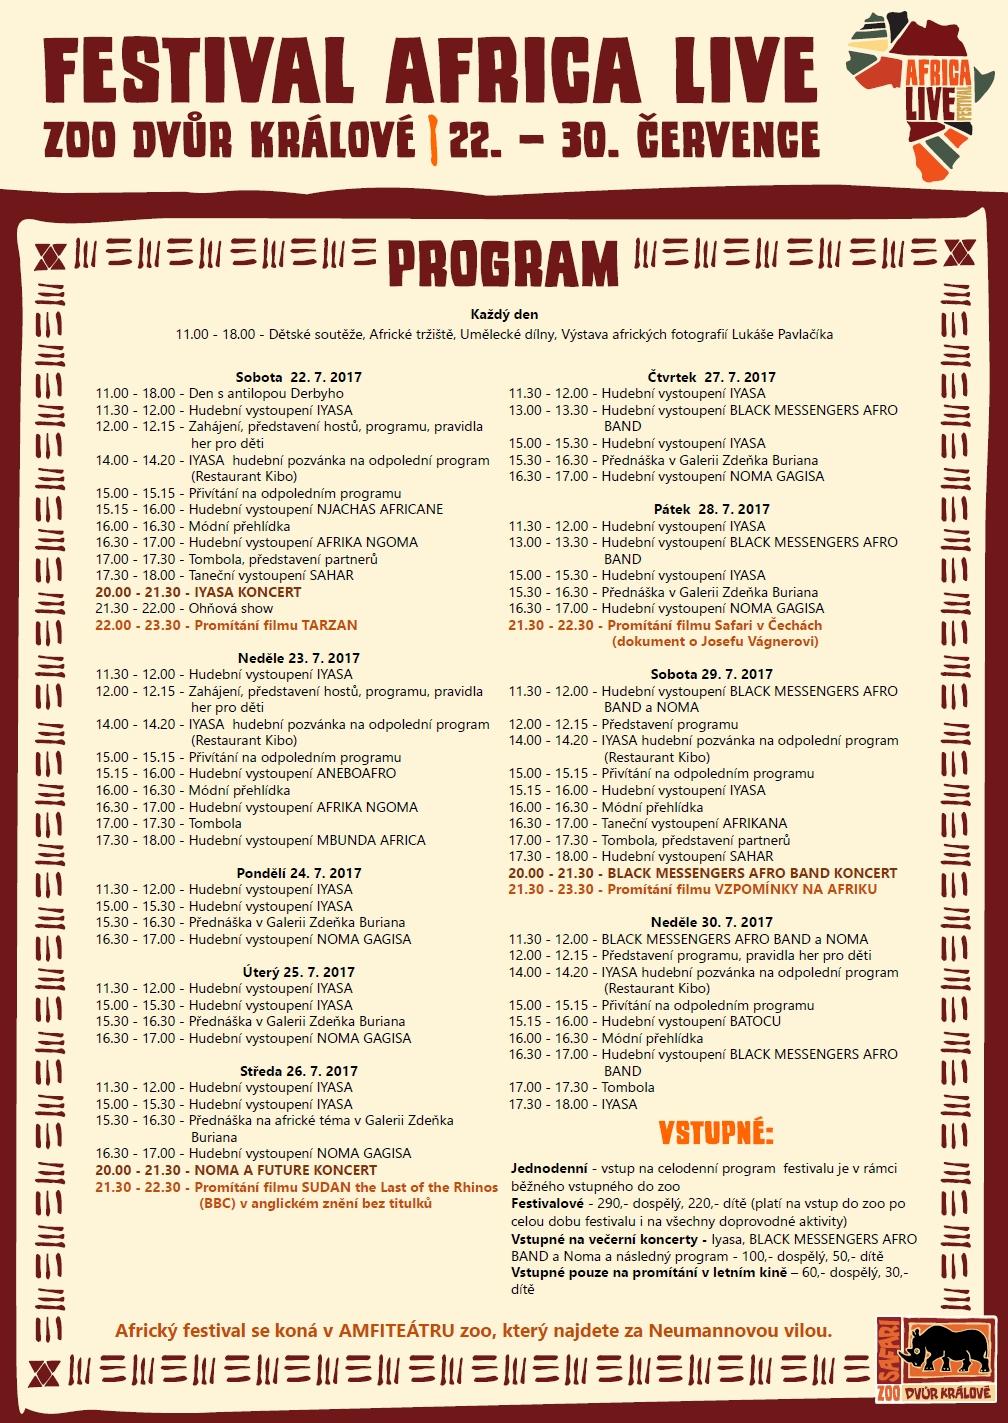 Program festivalu Africa Live 2017